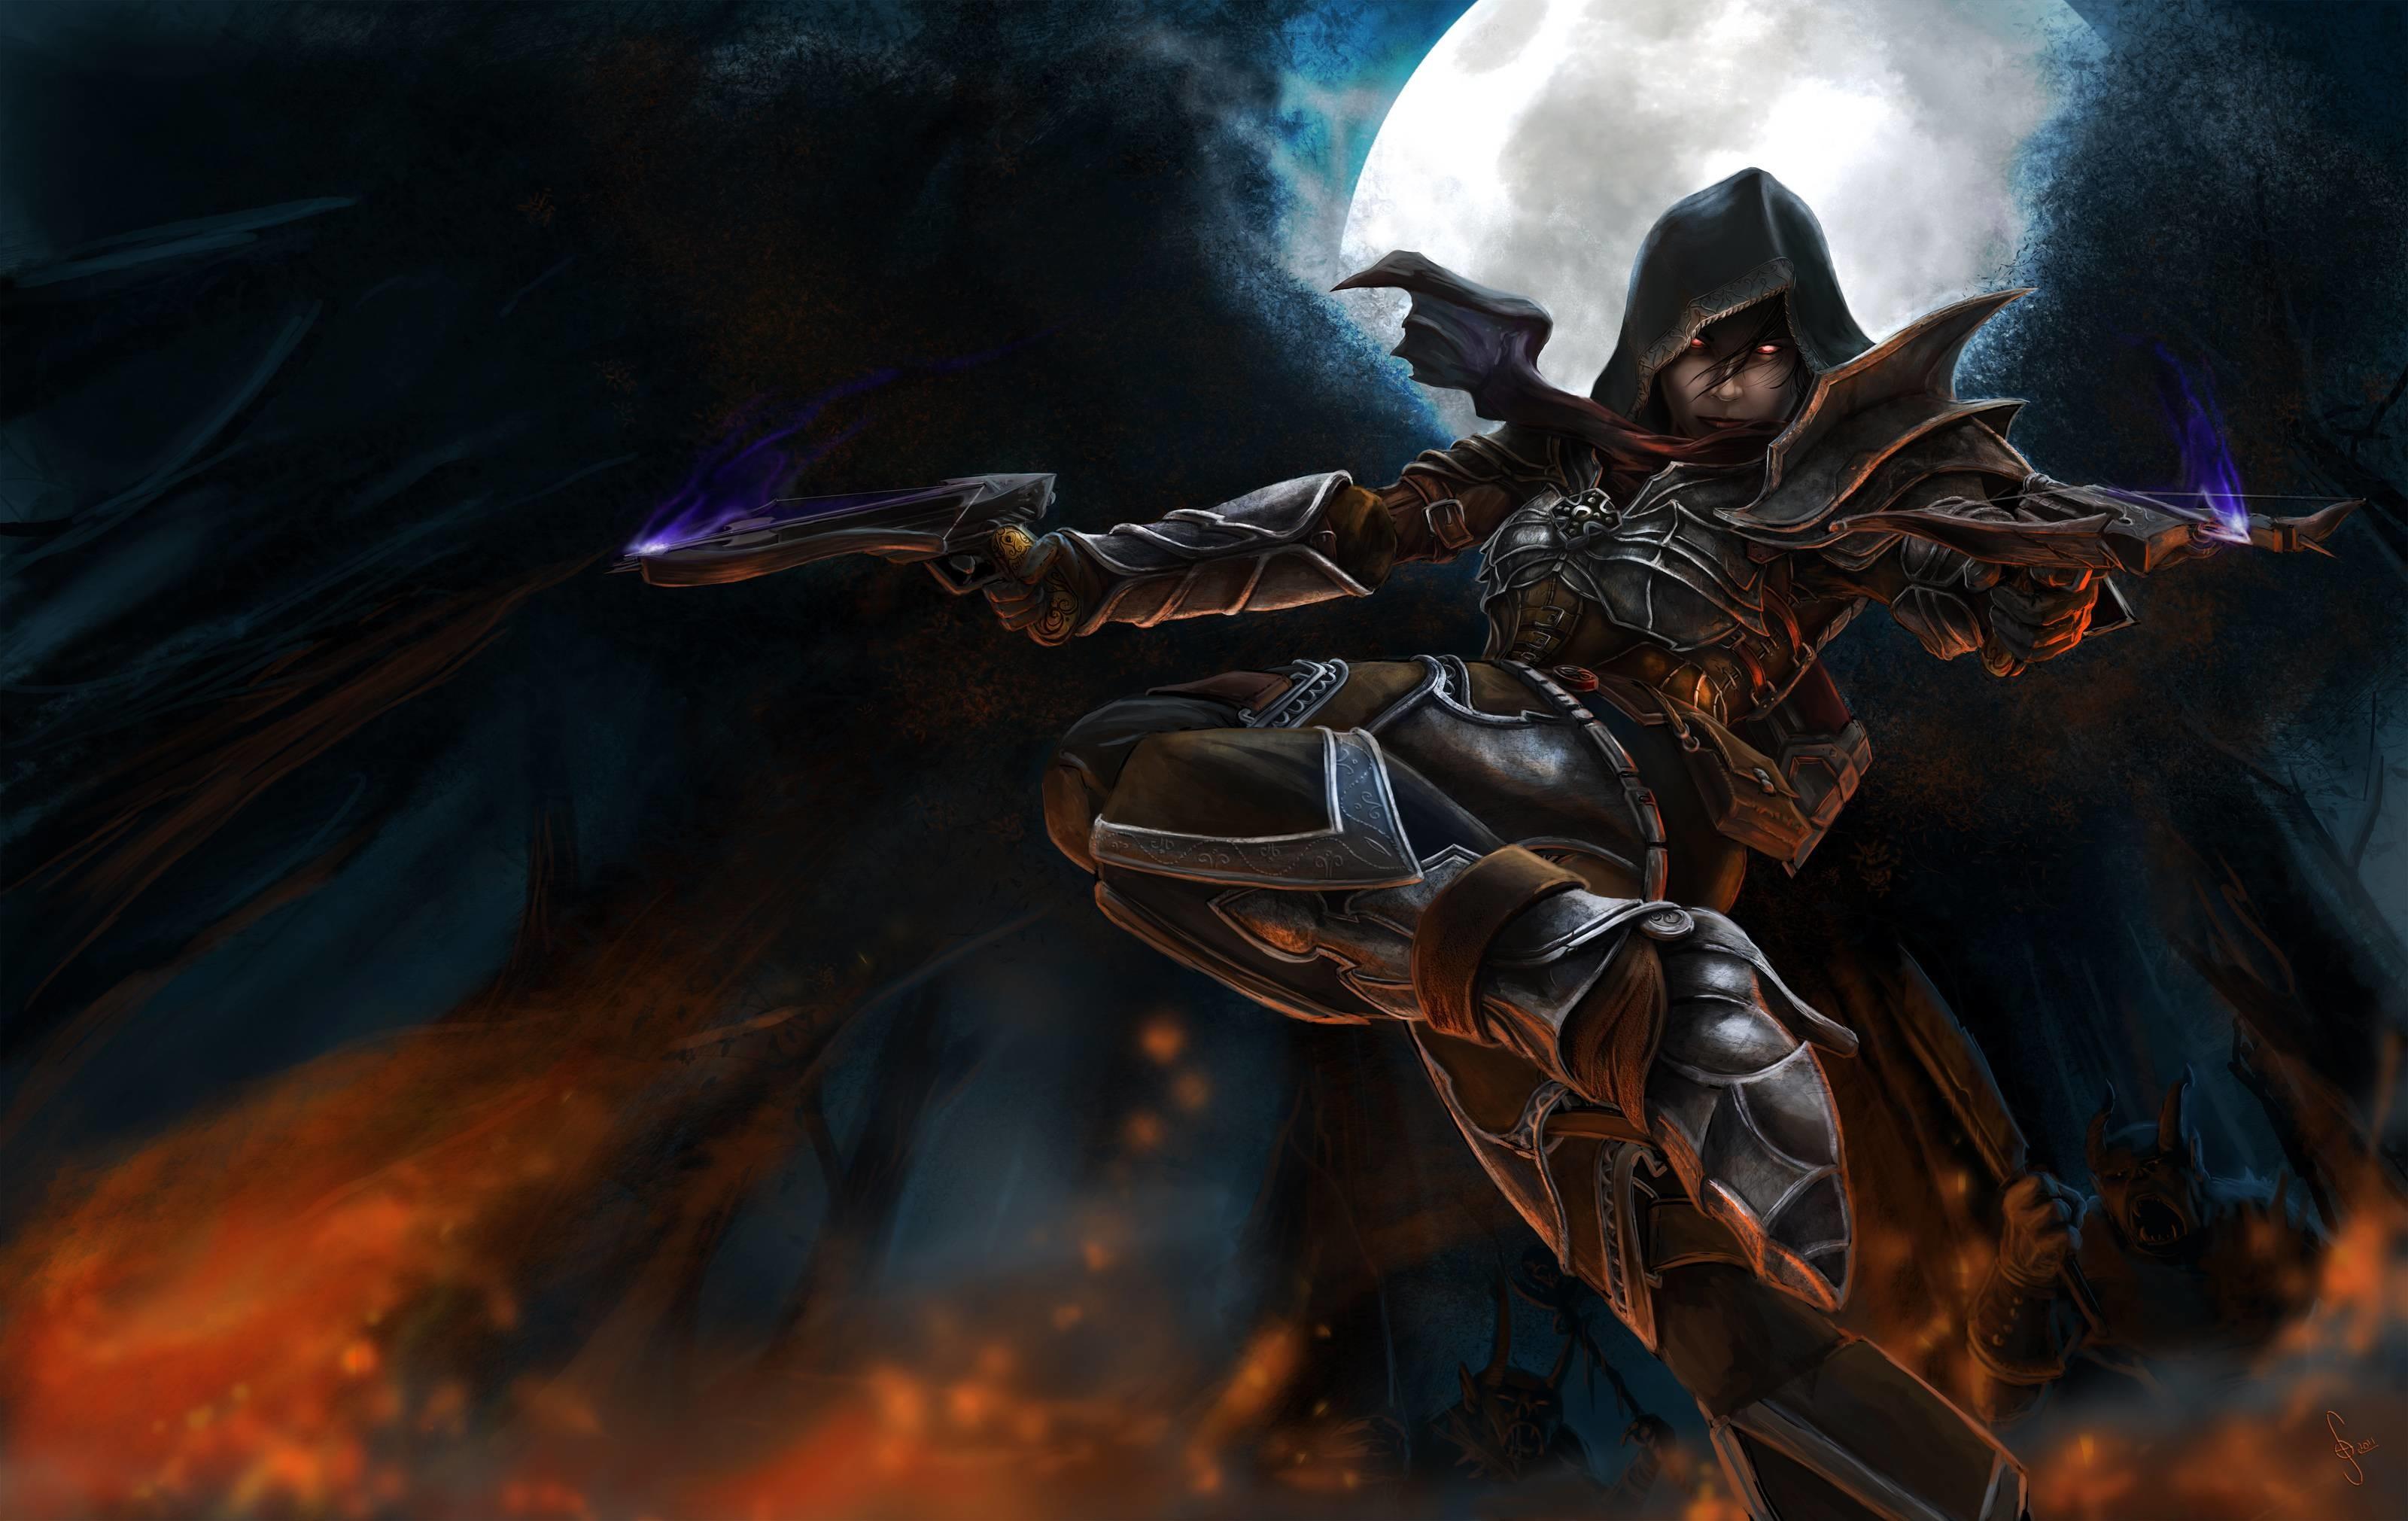 Diablo Demon Hunter Wallpaper Hdtv 3200x2021PX ~ Wallpaper Demon .